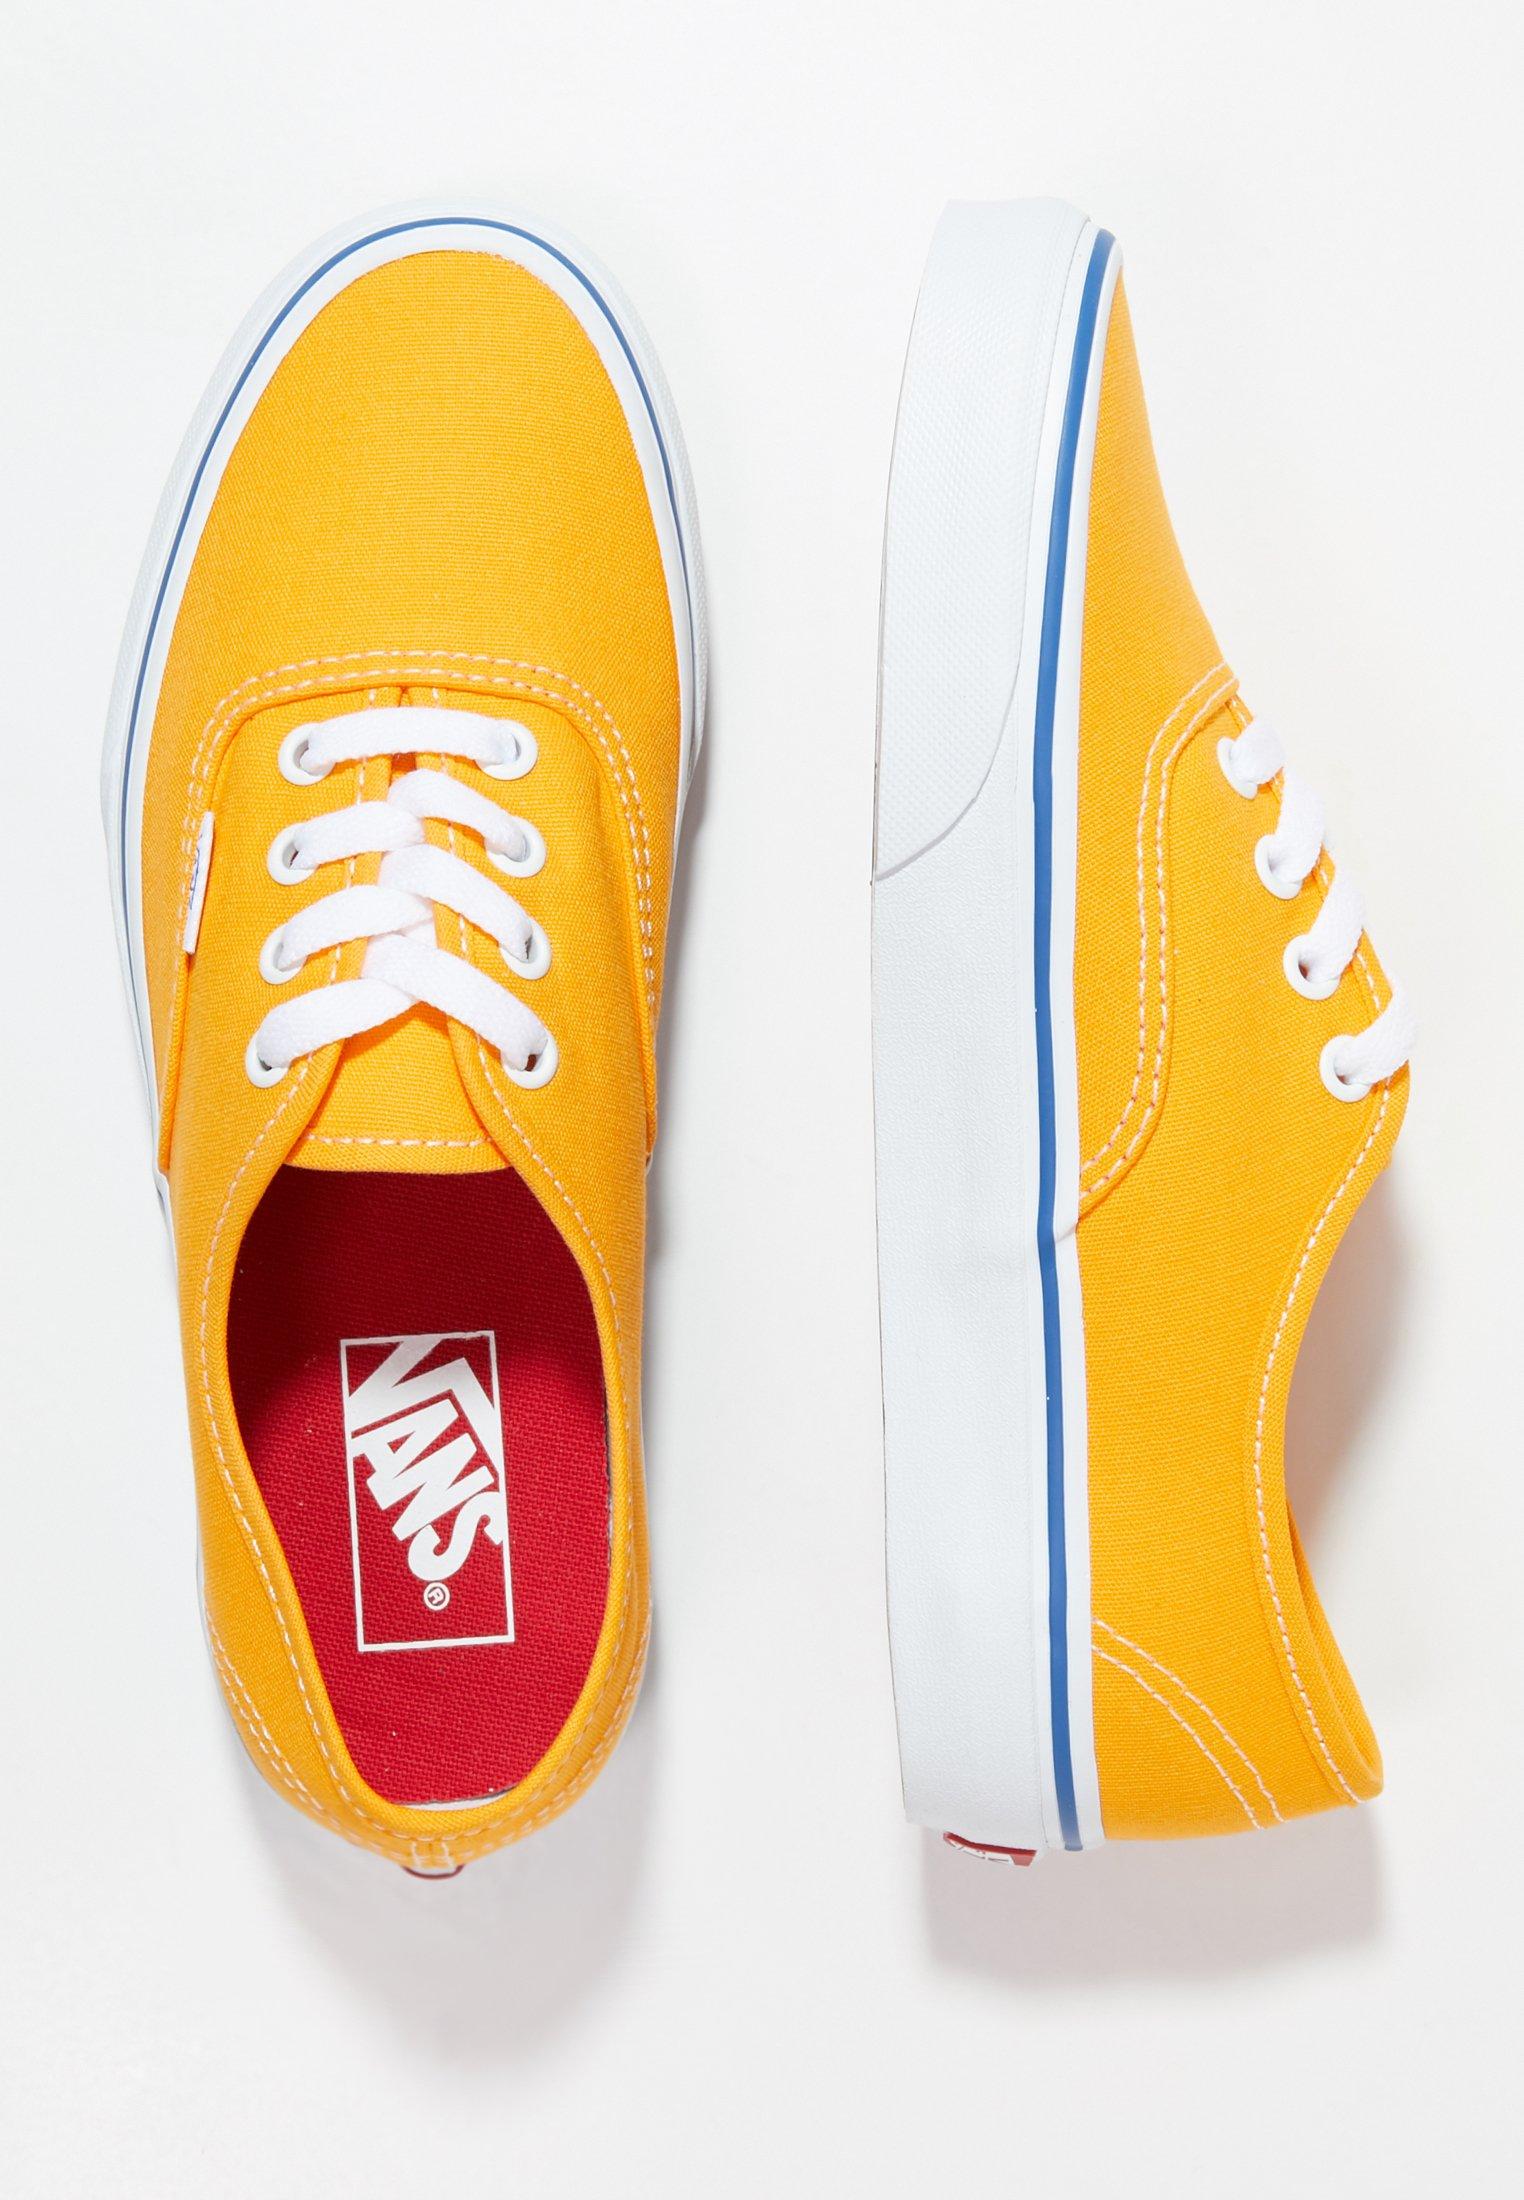 chaussure de skate vans jaune